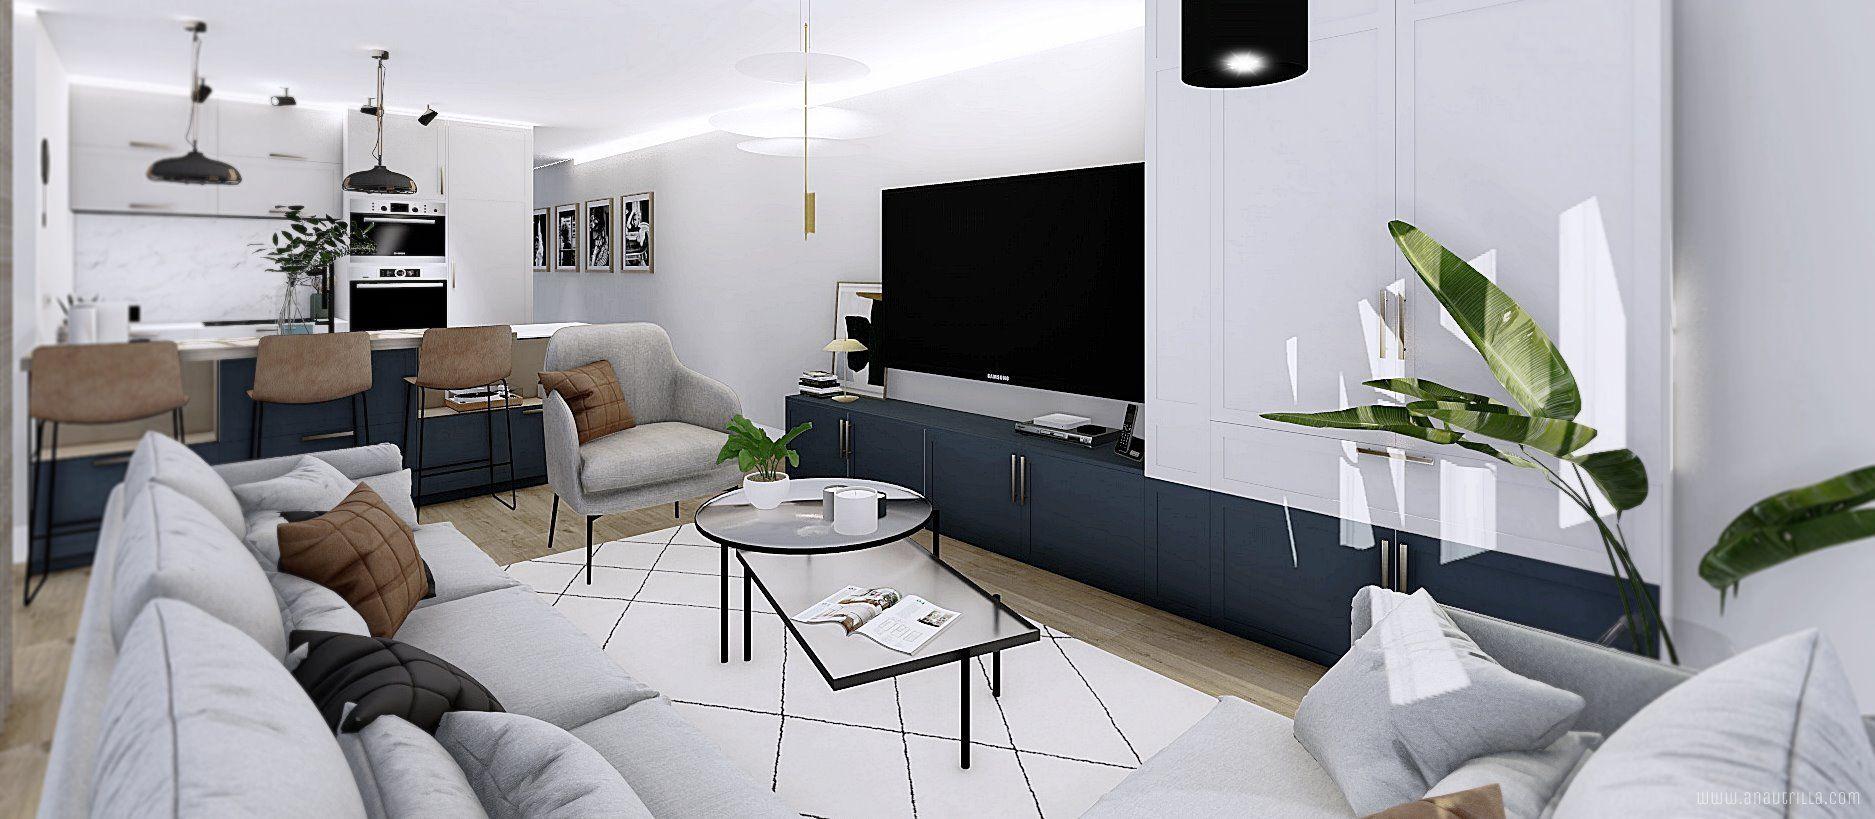 Espacio de salón cocina en 3D, vivienda de segunda mano con diseño a medida @utrillanais